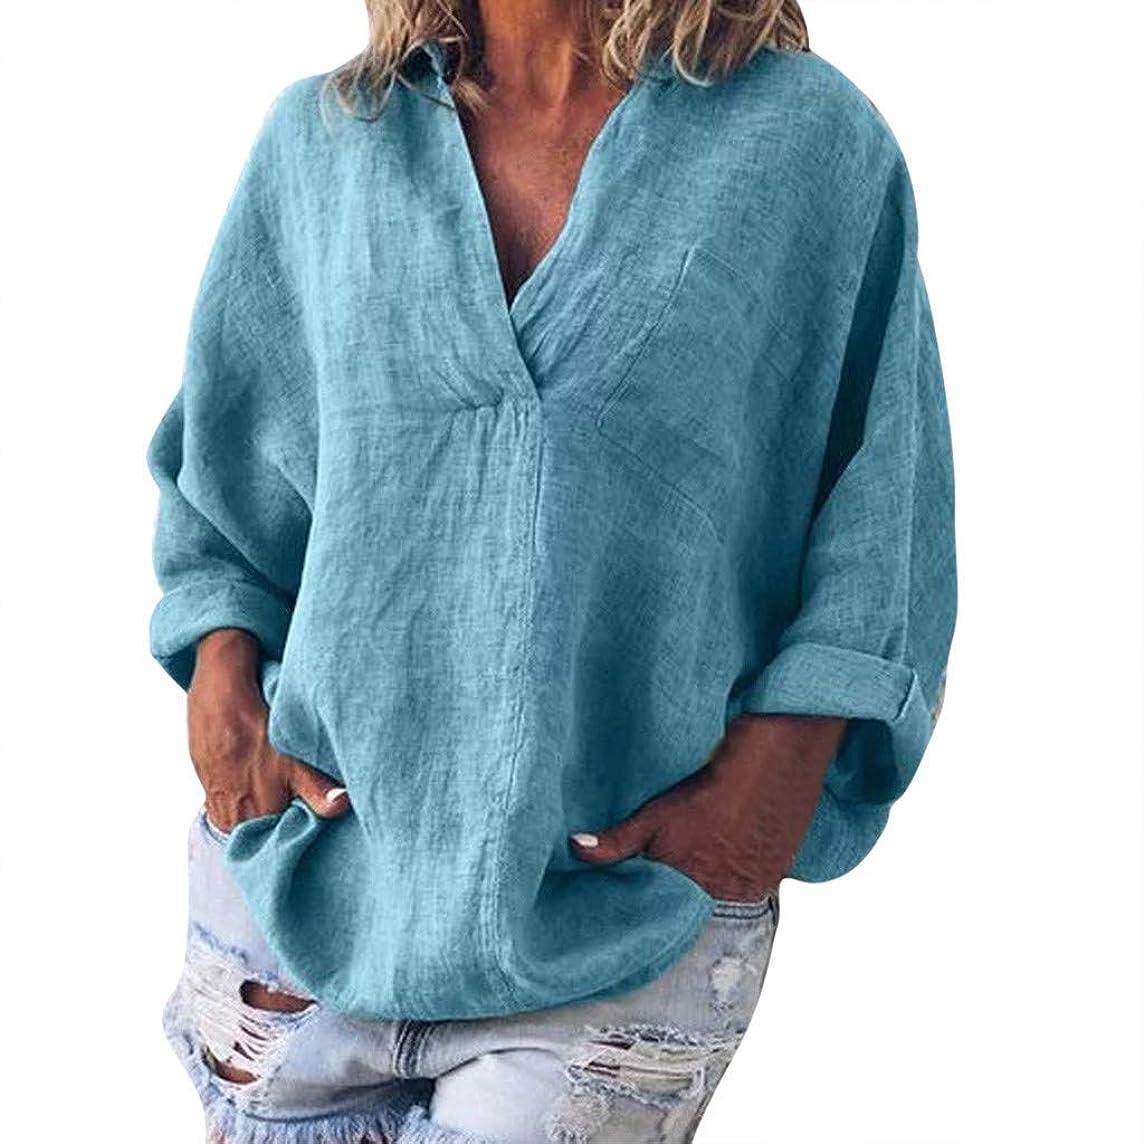 Plus Size Linen T-Shirt Women Fashion Solid Casual V-Neck Long Sleeve Blouse